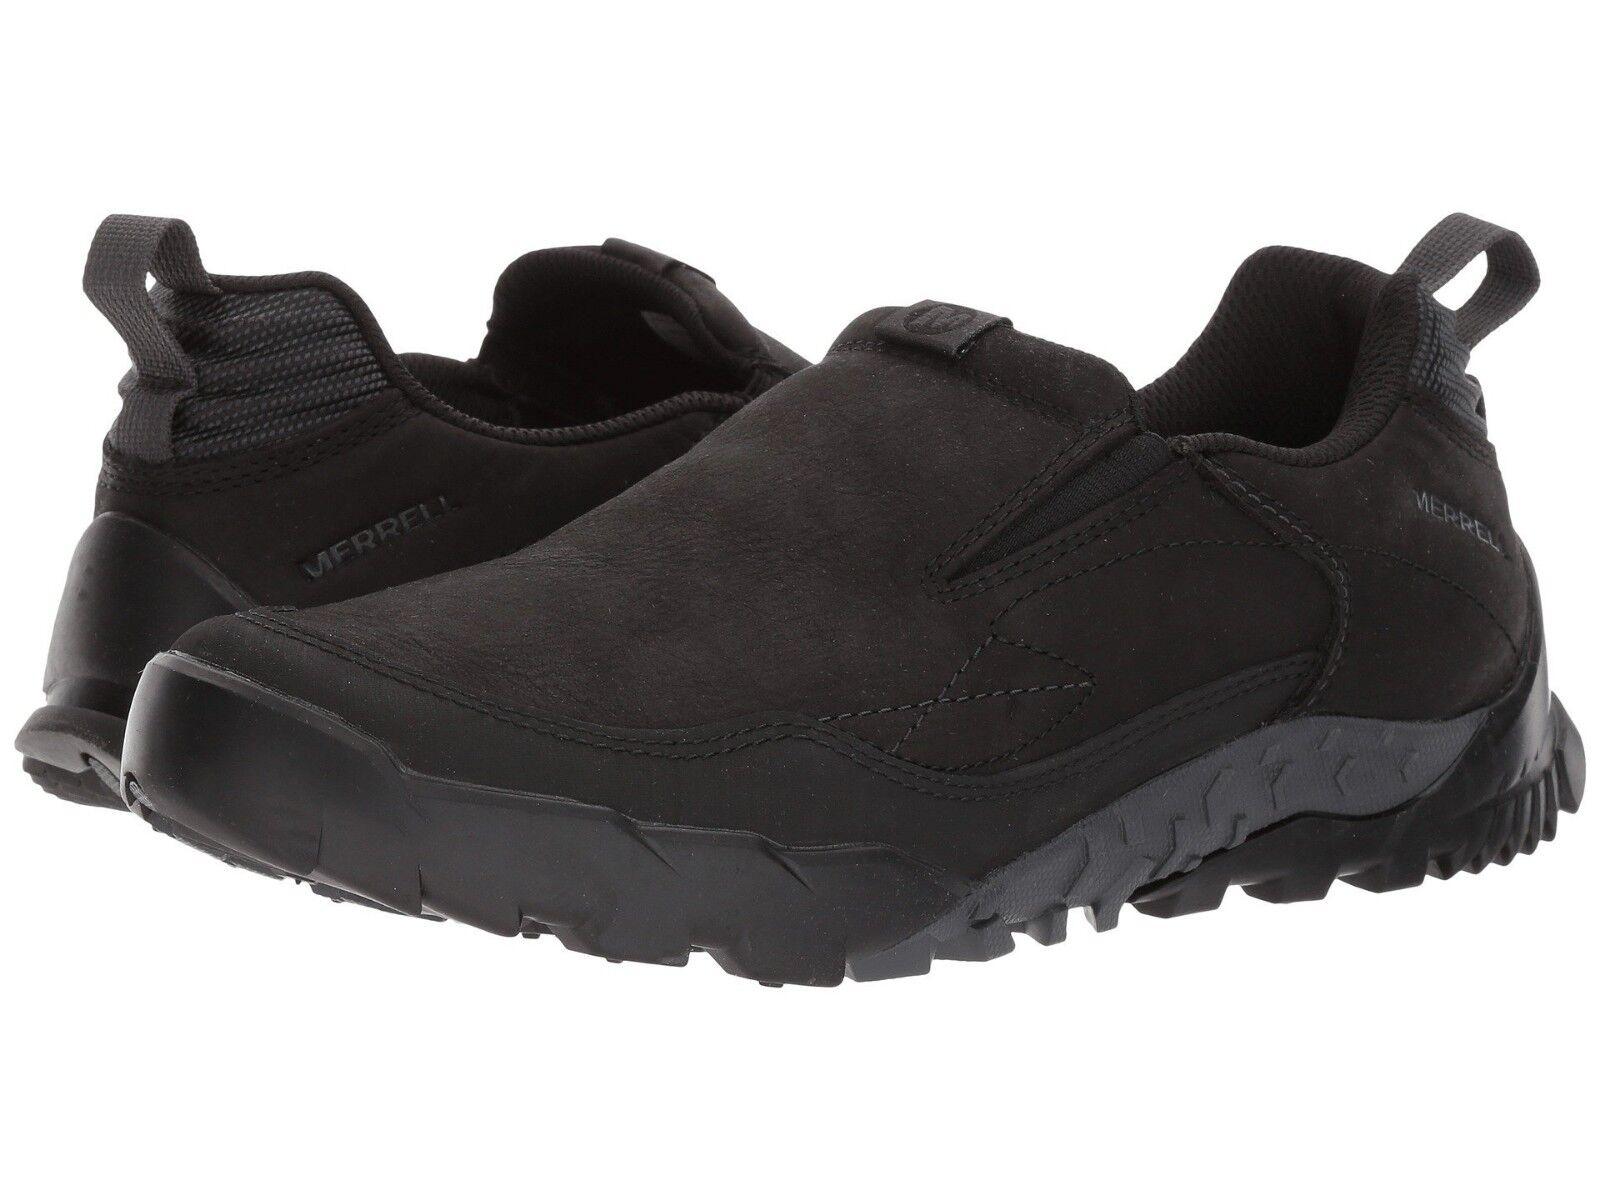 Nuevo Para Hombre Merrell Anexo Trak Moc Toe Mocasín Negro Negro Negro Nubuck Cuero Mocasines ea48b2